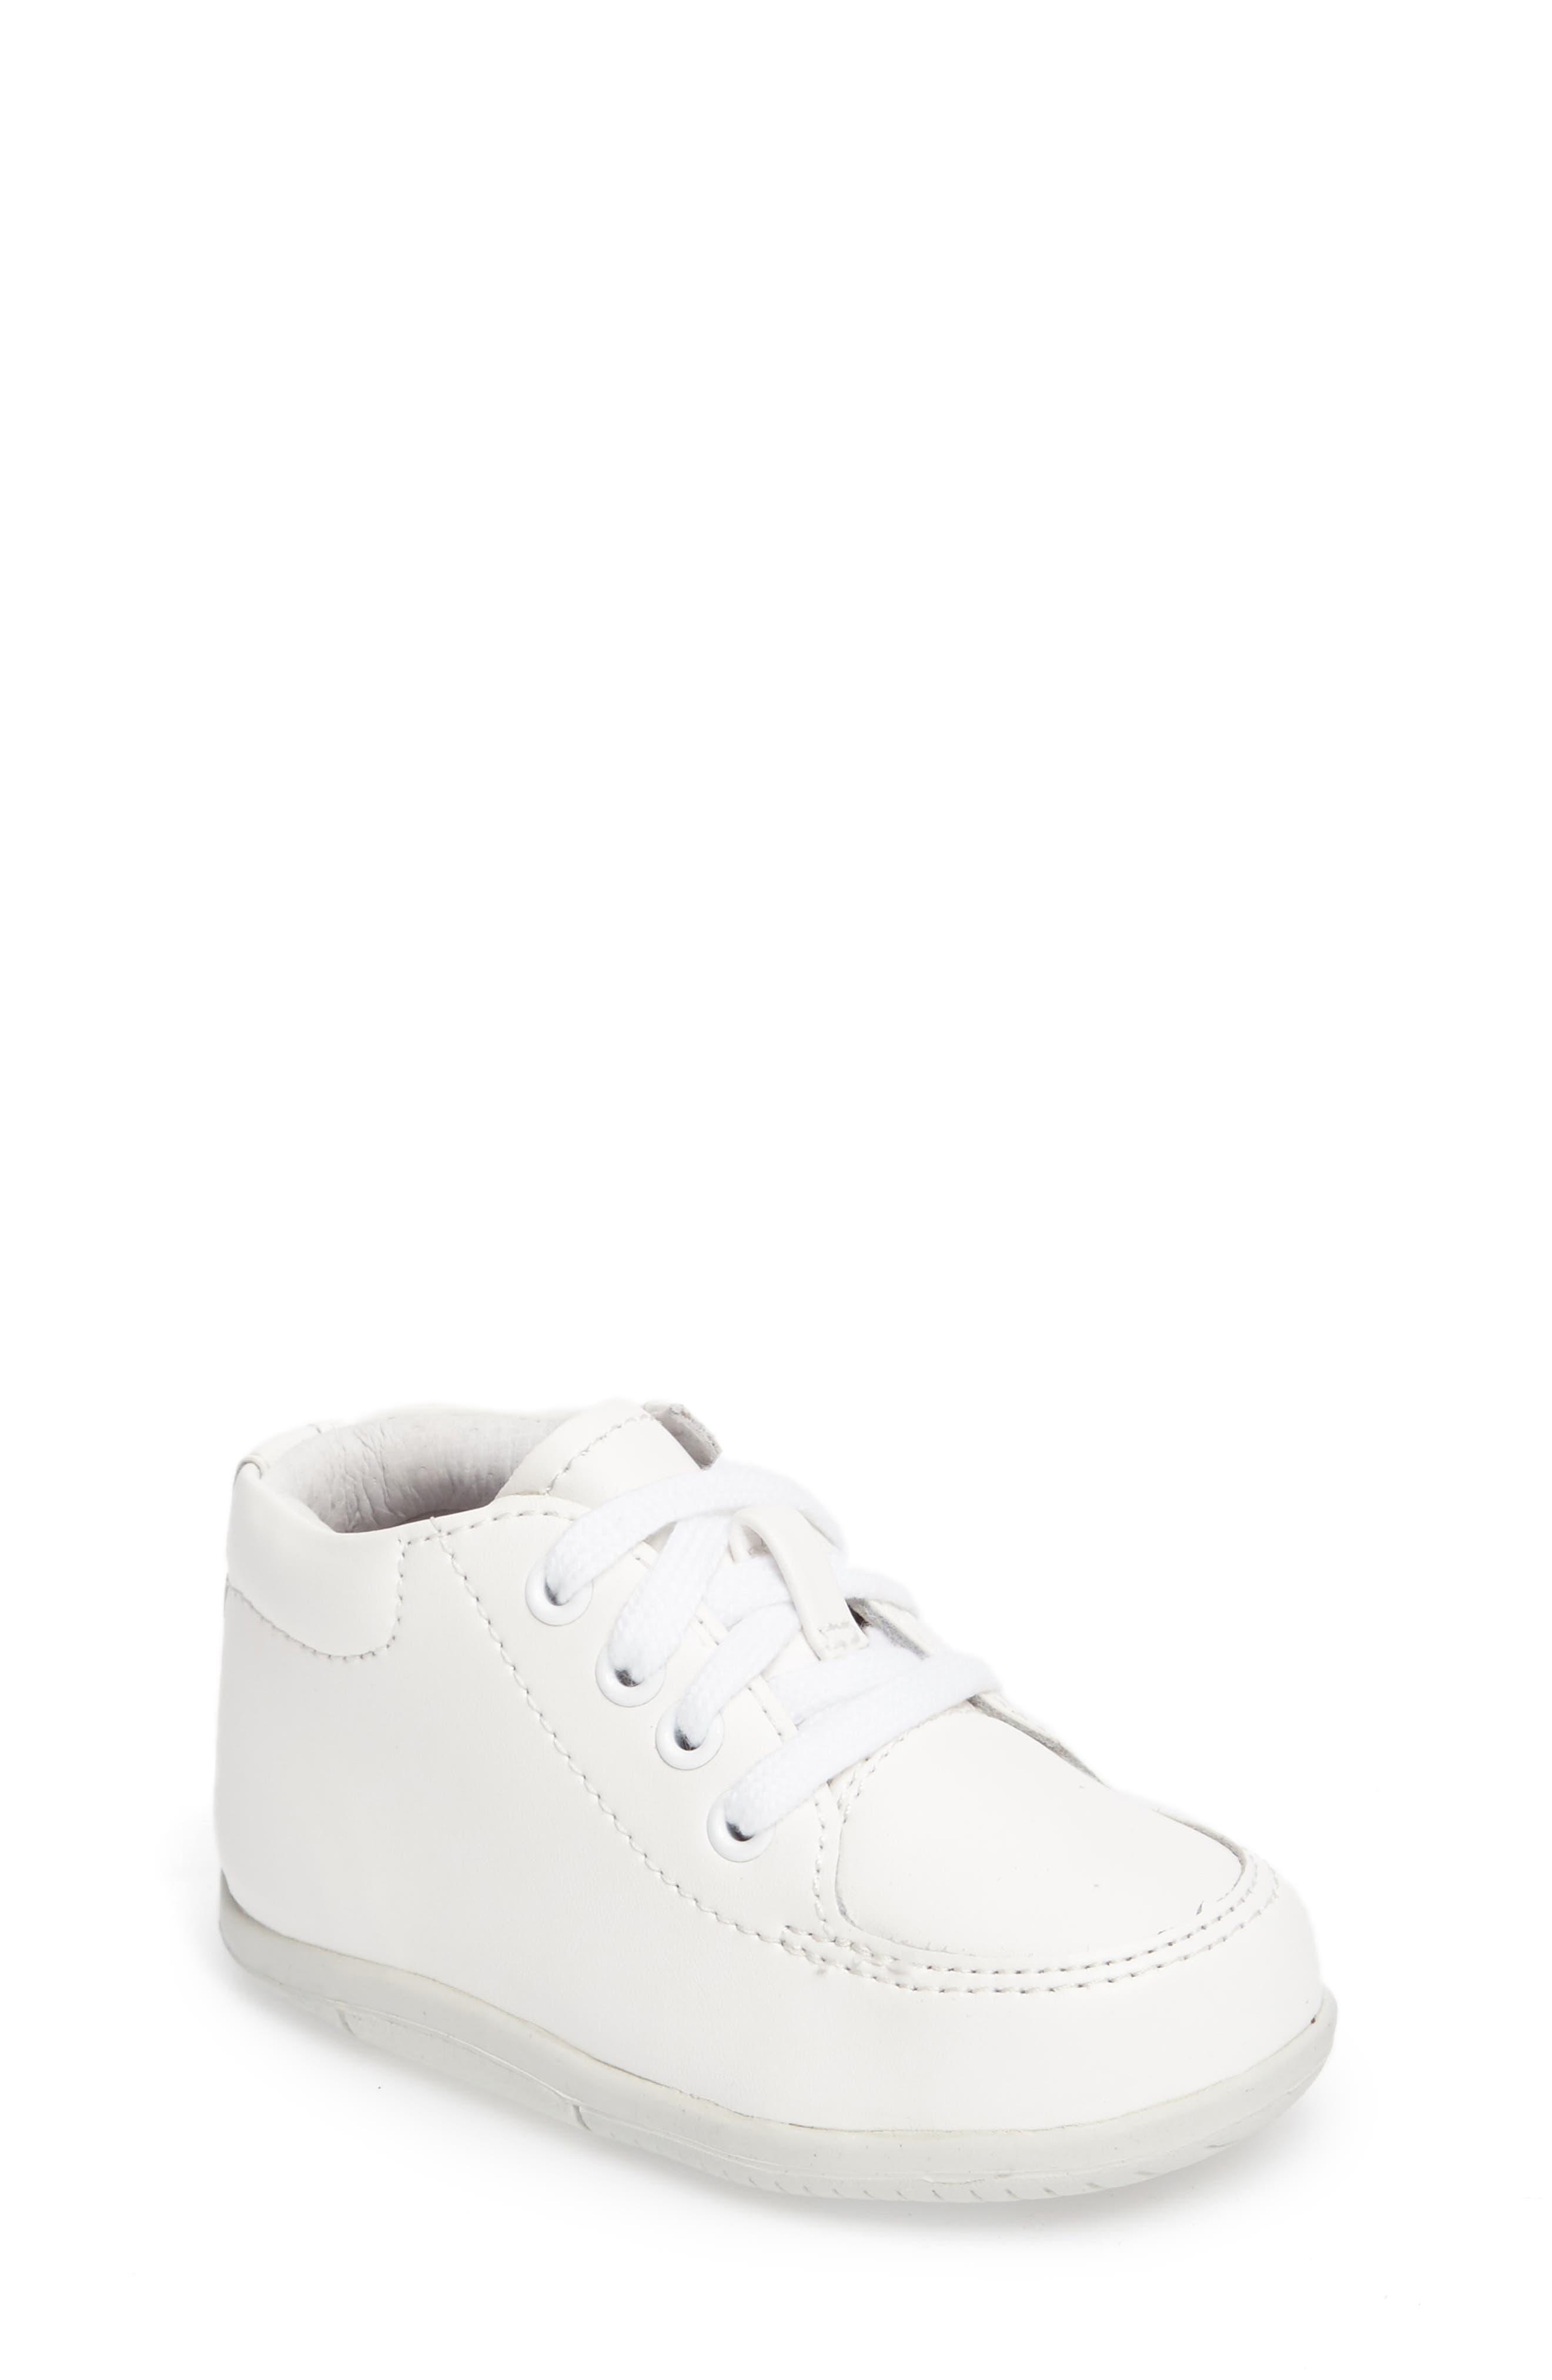 STRIDE RITE, Grayson Sneaker, Main thumbnail 1, color, WHITE